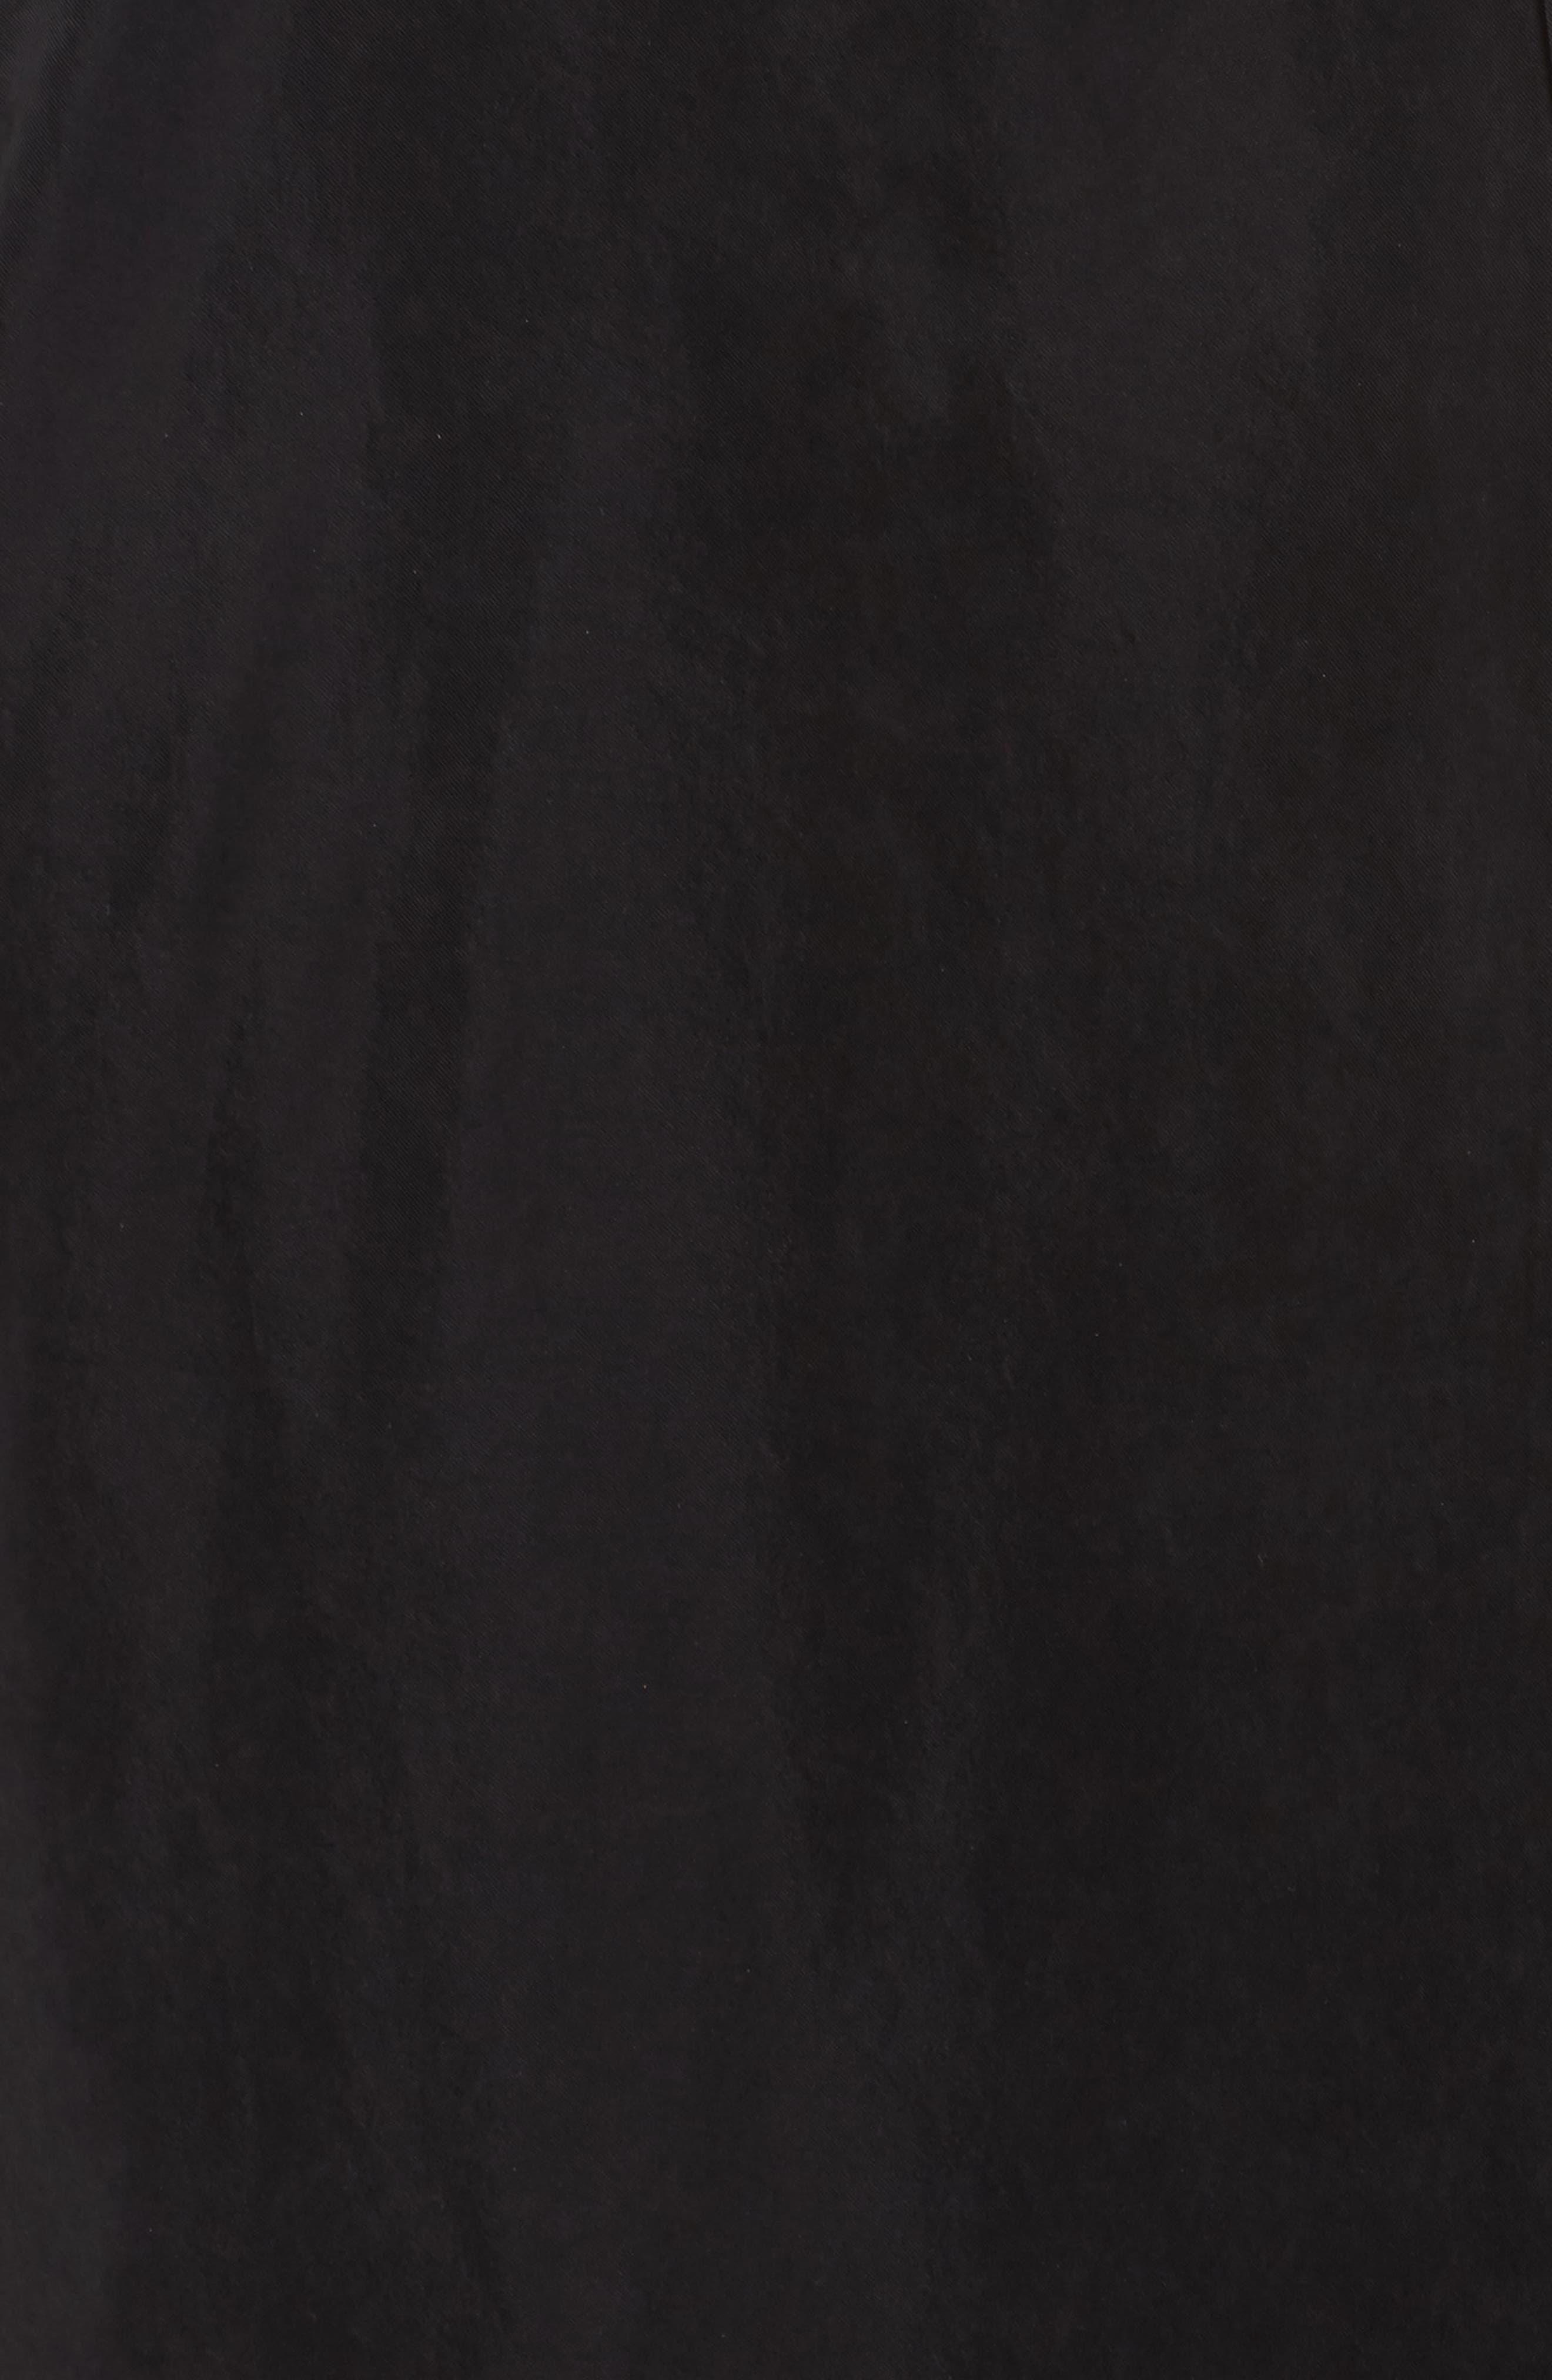 Milly One-Shoulder Wrap Dress,                             Alternate thumbnail 5, color,                             Black